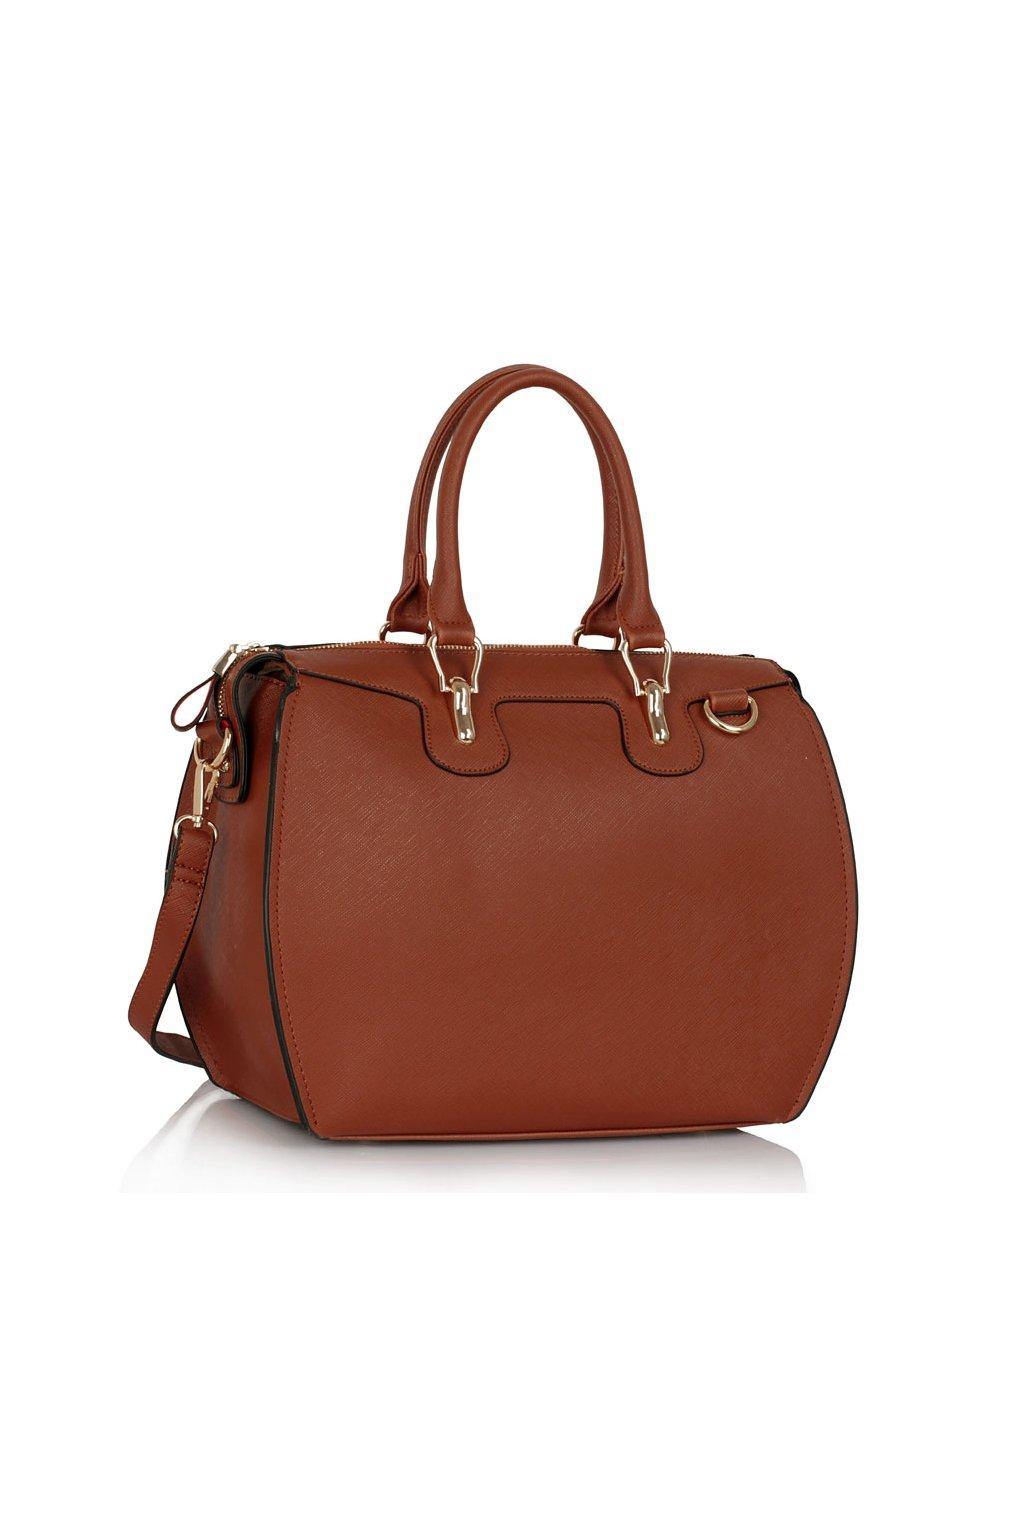 Shopper kabelka do ruky Clementine hnedá LS0099A